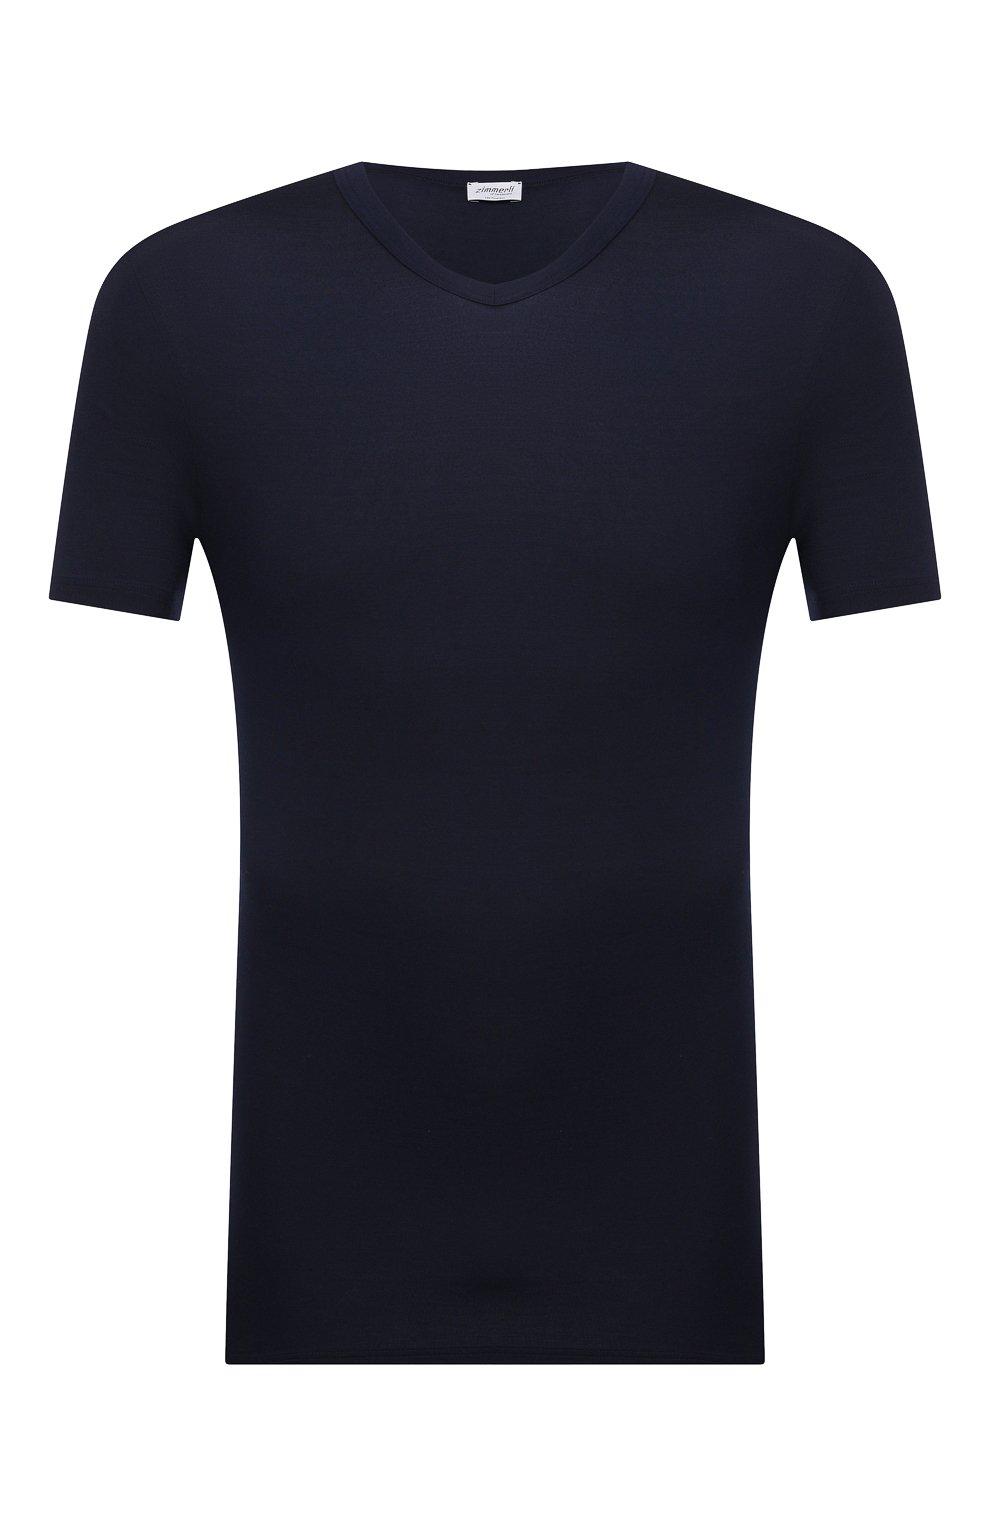 Мужская футболка ZIMMERLI темно-синего цвета, арт. 700-1346 | Фото 1 (Кросс-КТ: домашняя одежда; Рукава: Короткие; Материал внешний: Синтетический материал; Длина (для топов): Стандартные; Мужское Кросс-КТ: Футболка-белье)